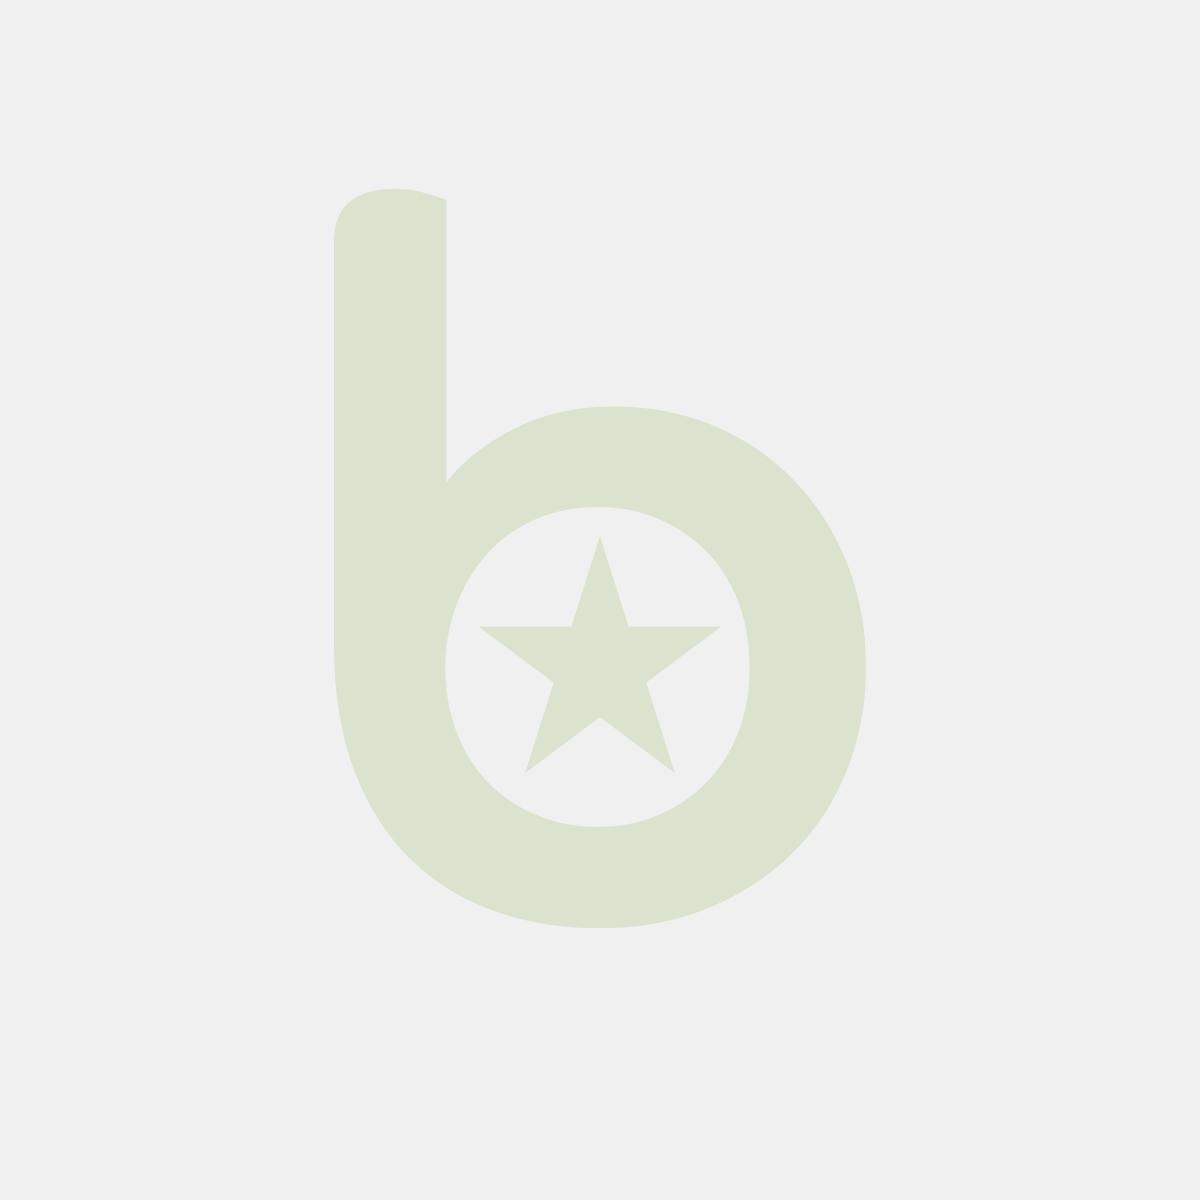 Pojemnik GN 1/2 Profi Line z polipropylenu